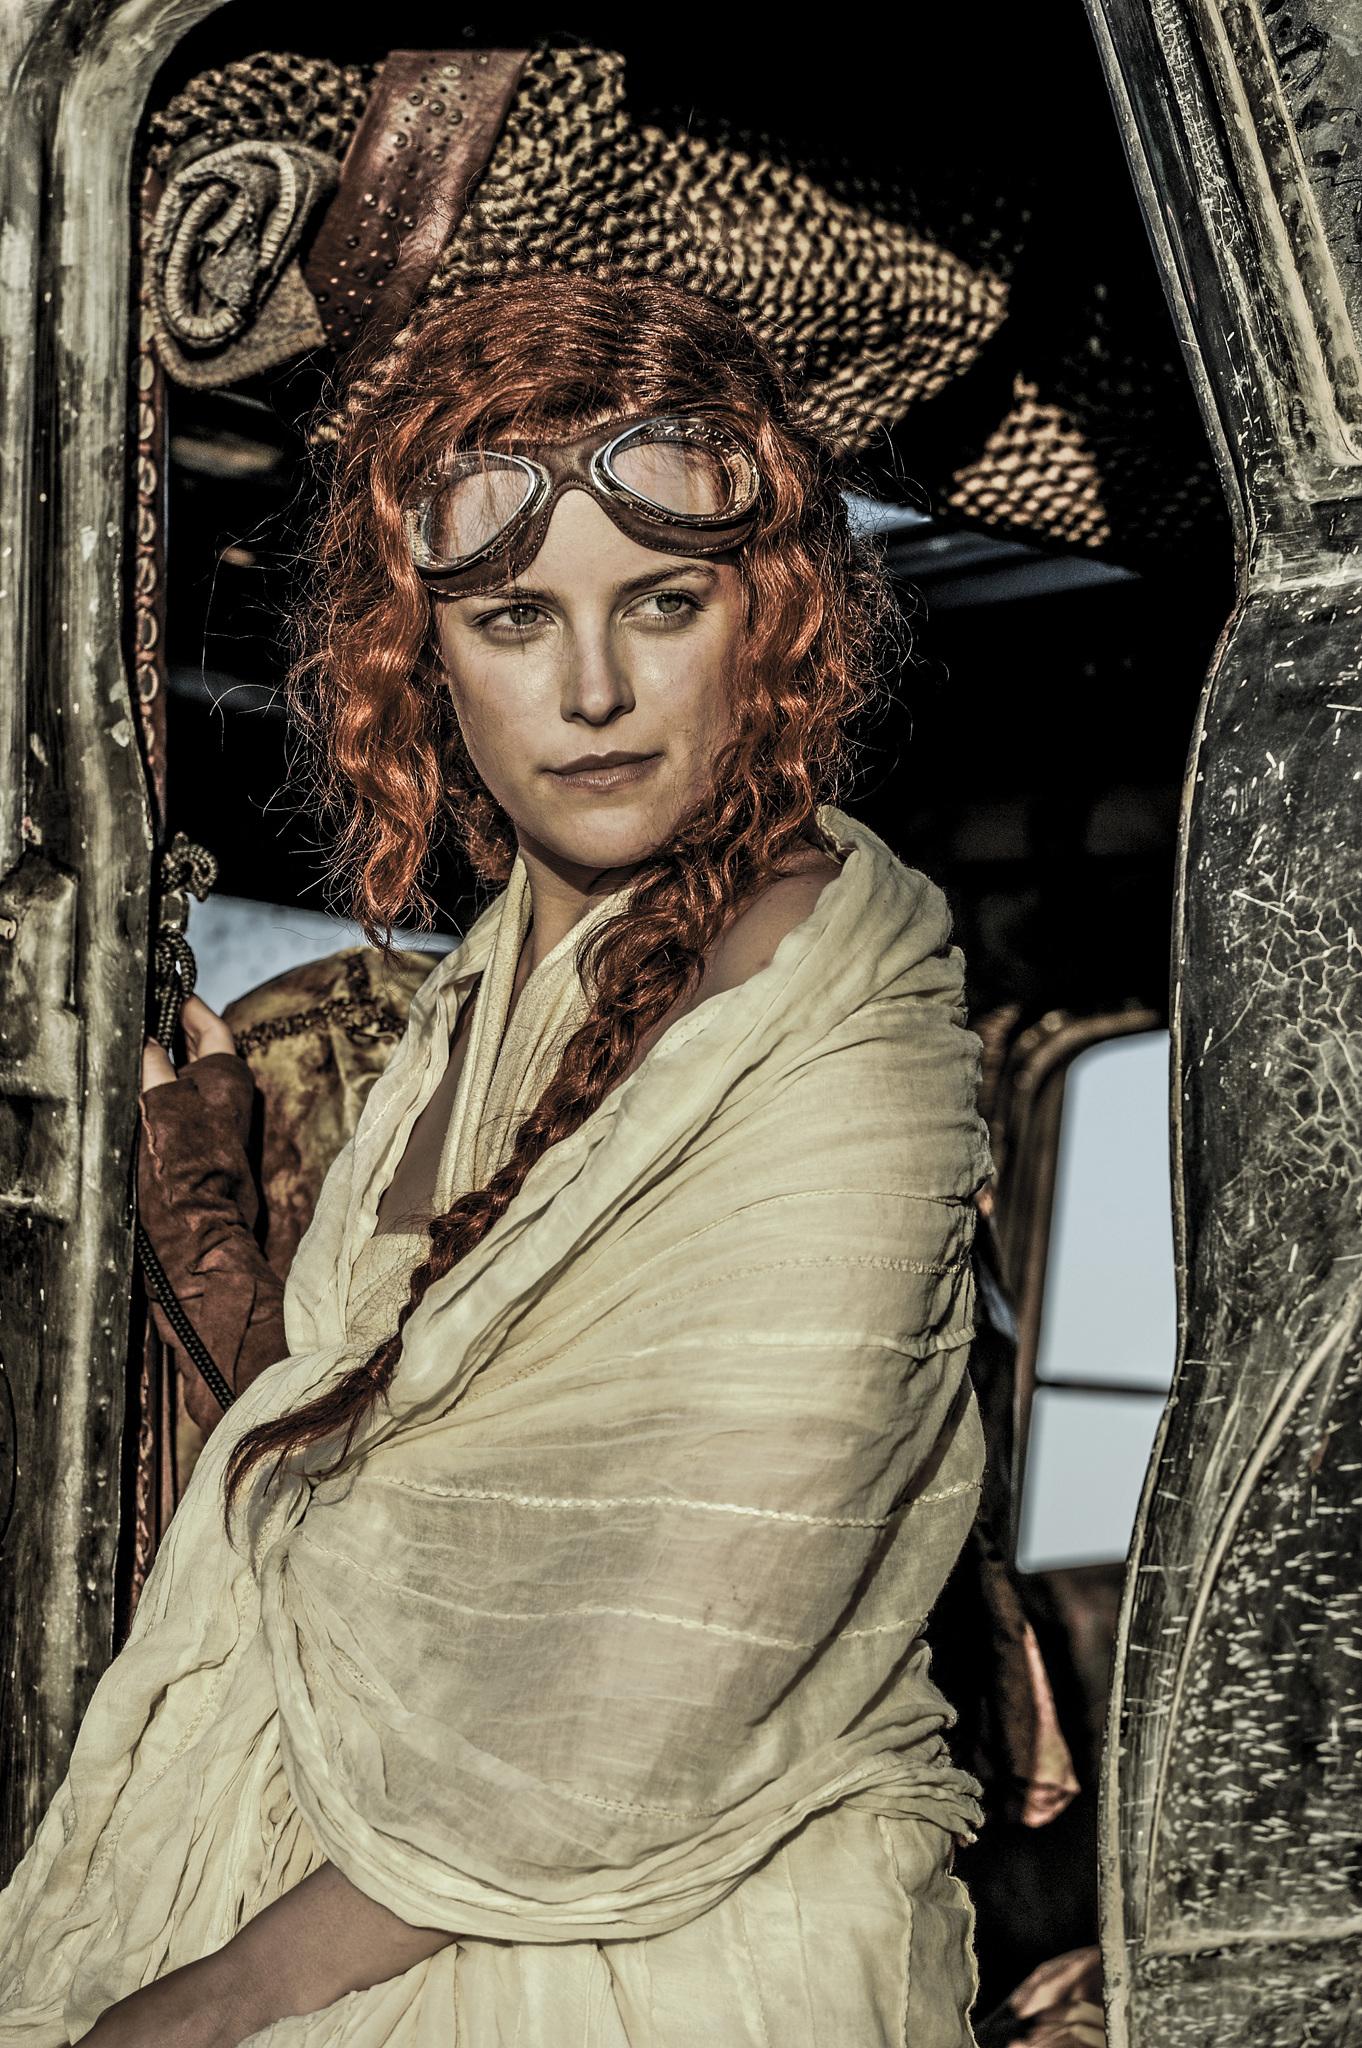 Riley Keough in Mad Max: Fury Road (2015)